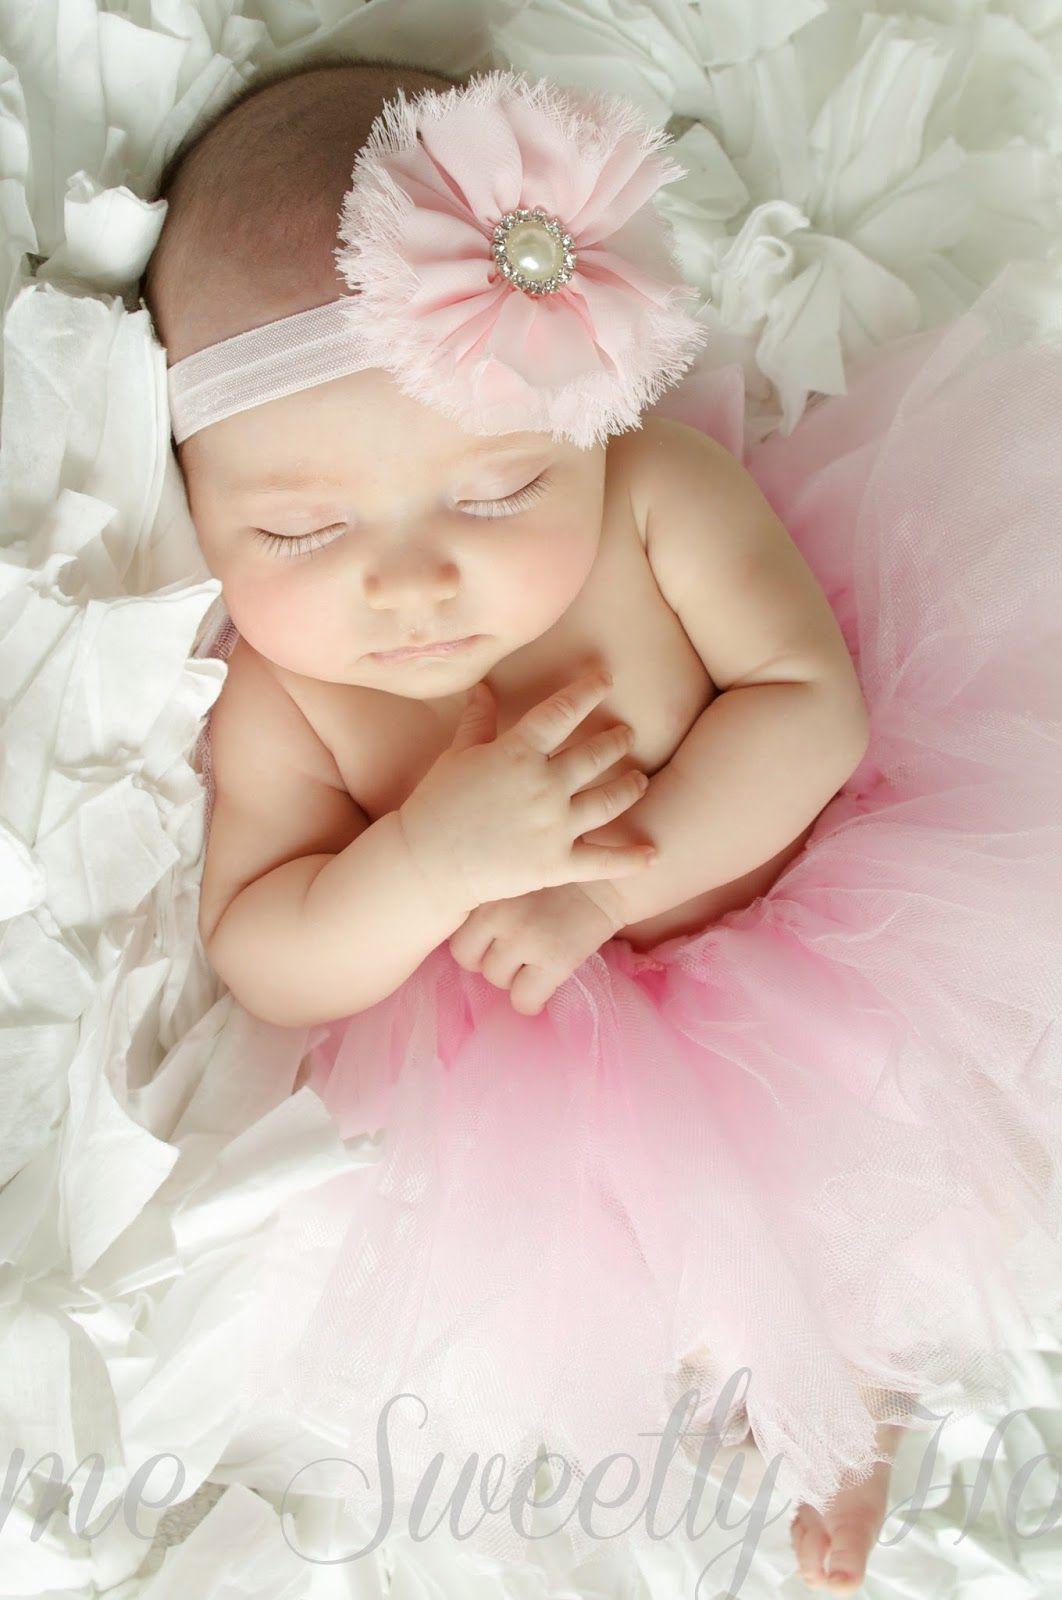 Baby Girl Photoshoot Ideas At Home : photoshoot, ideas, Photography, Sneak, Rowdi, Weeks, Newborn, Girl,, Photography,, Photos